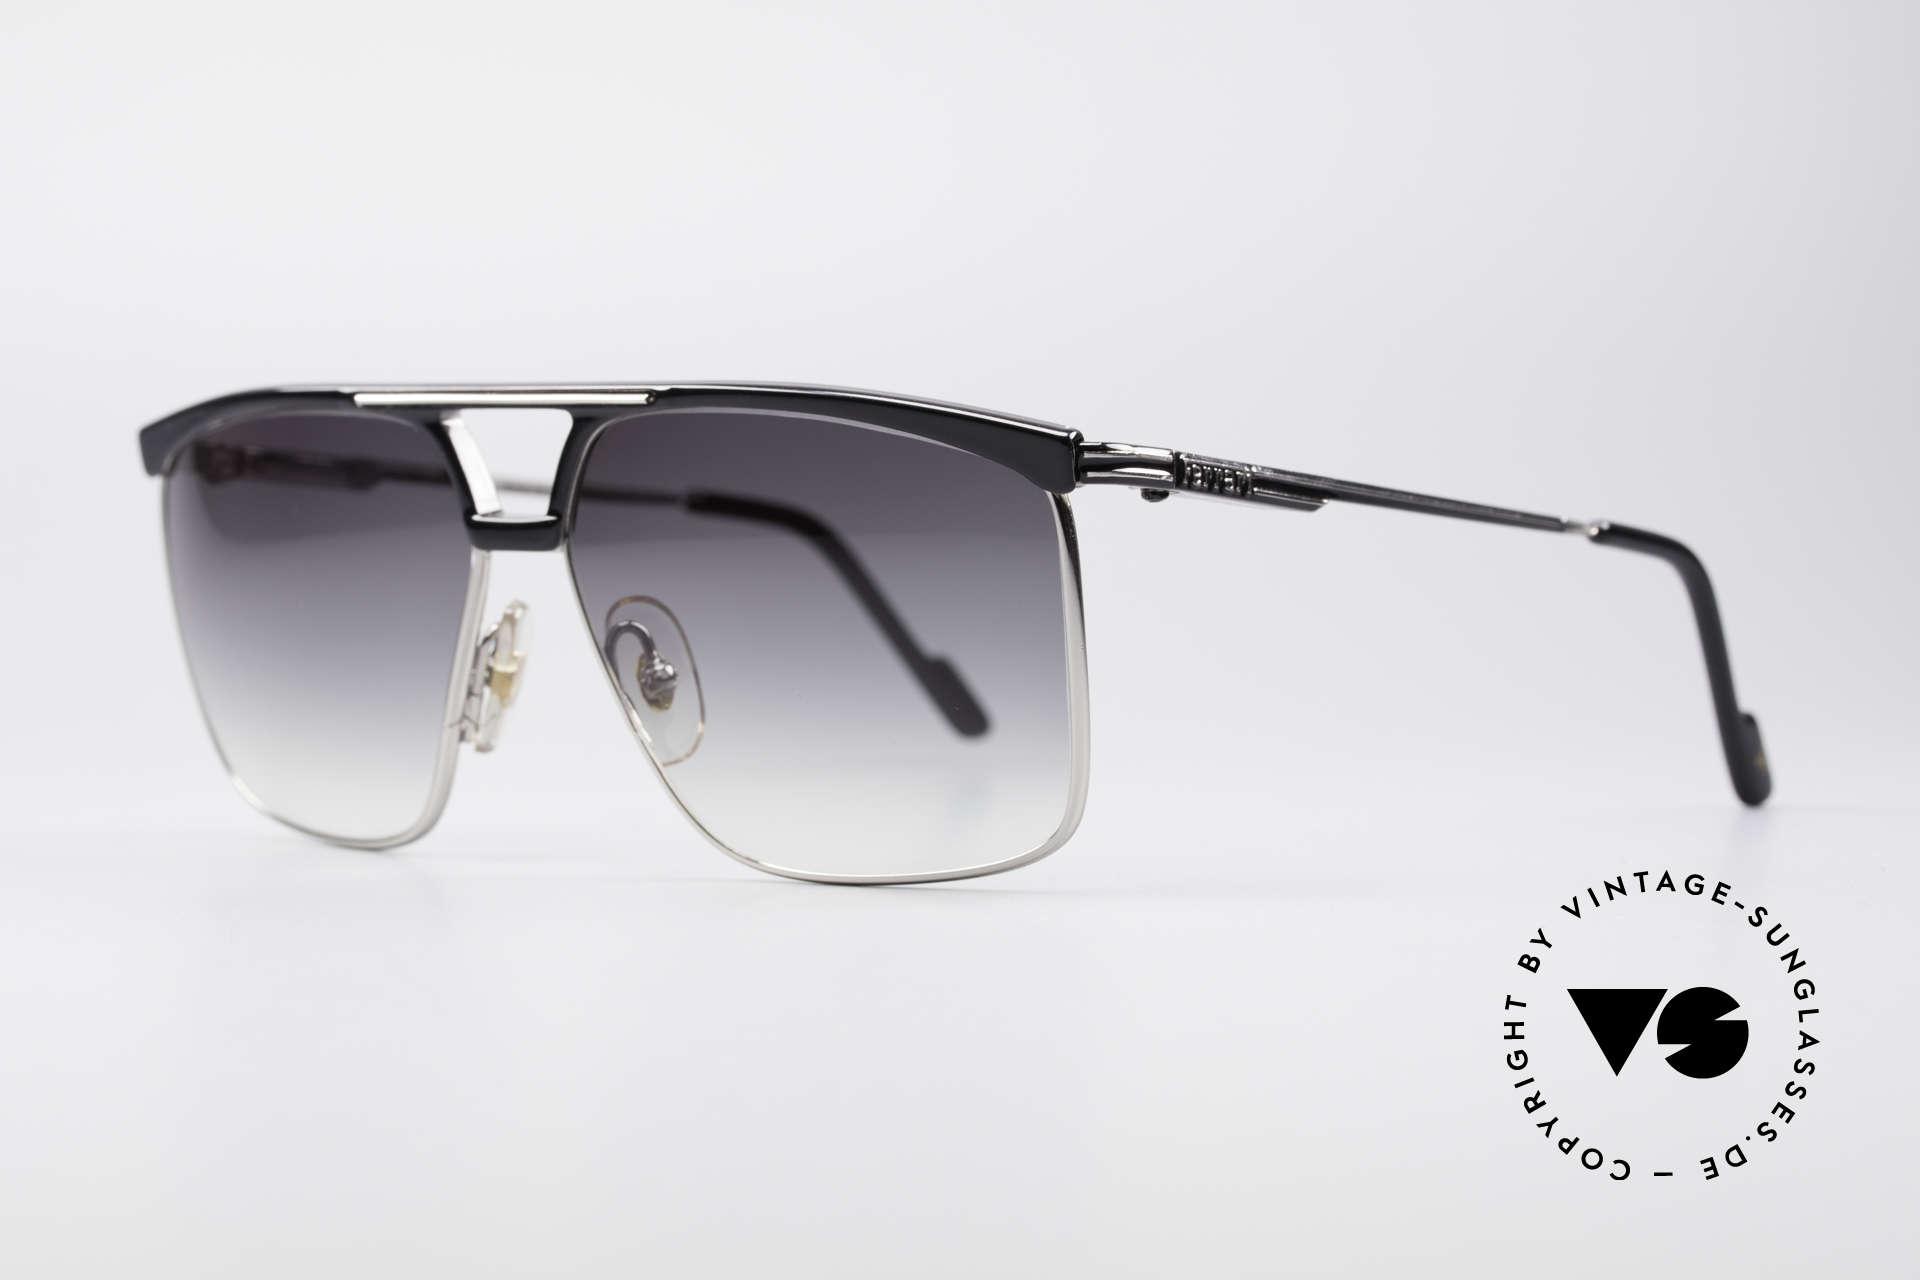 Ferrari F35 Men's 80's Vintage Shades, high-end Alutanium frame with flexible spring hinges, Made for Men